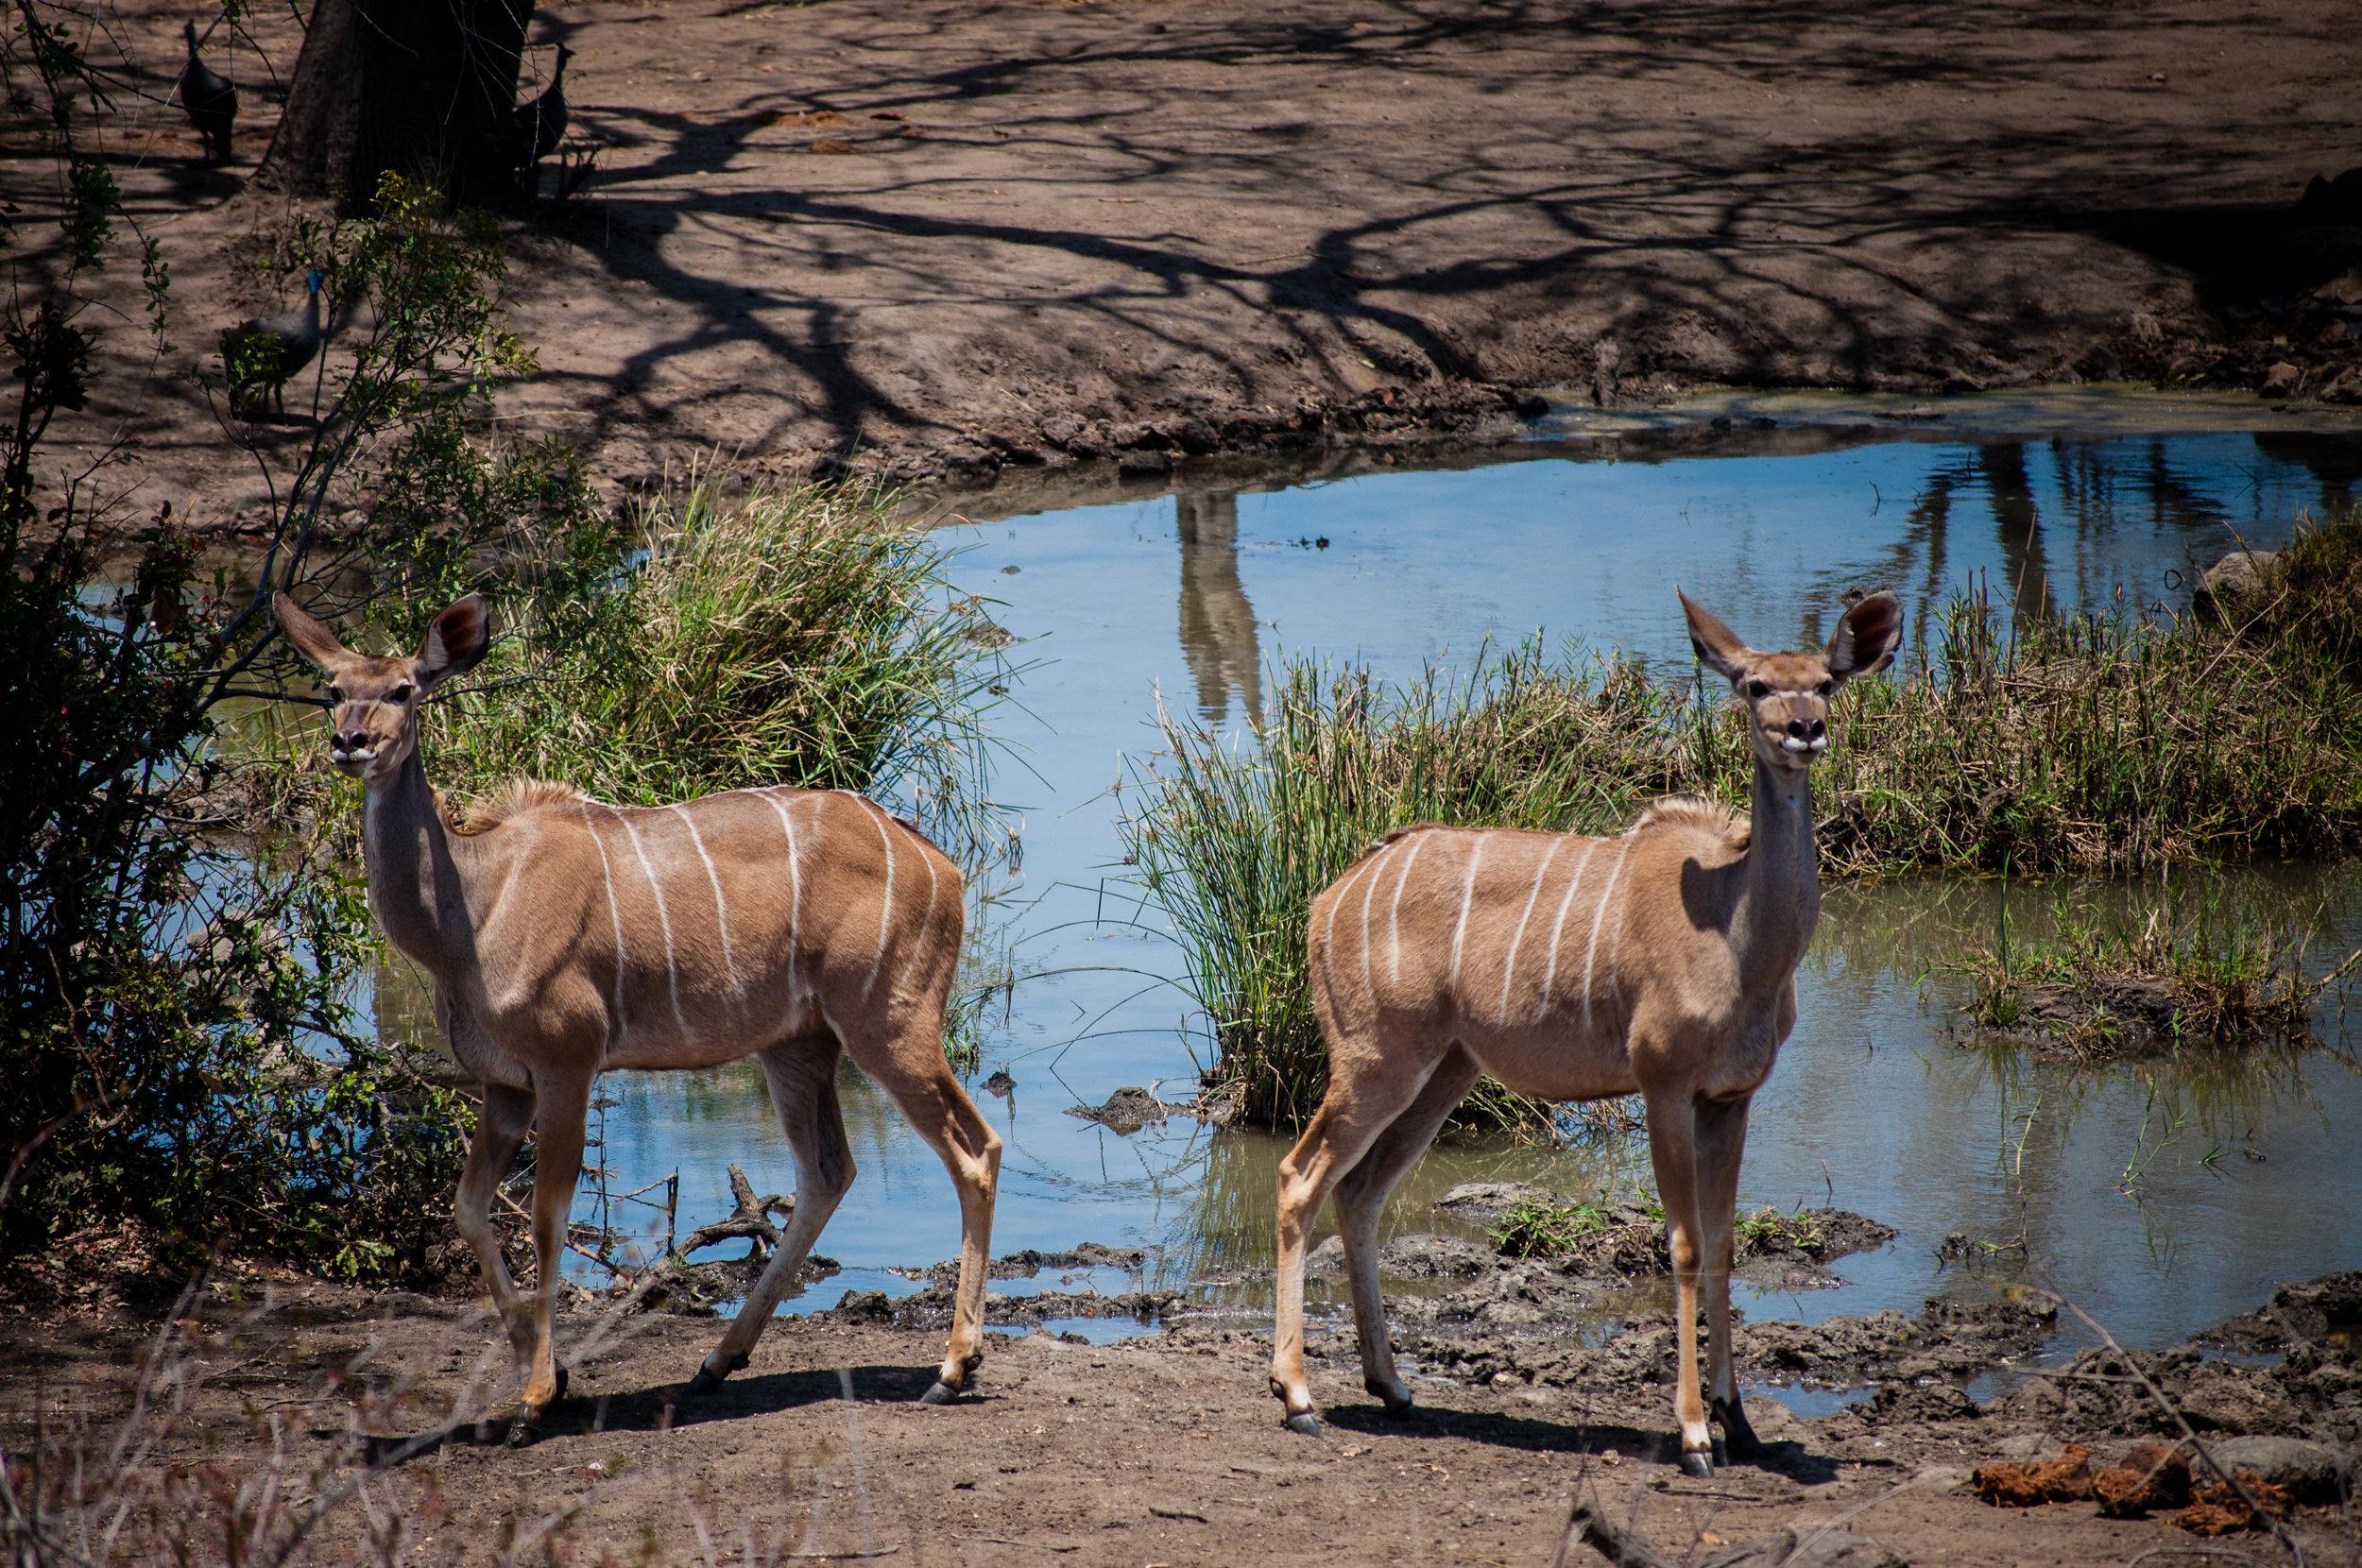 Animals drinking water at a safari private lodge. safari planner